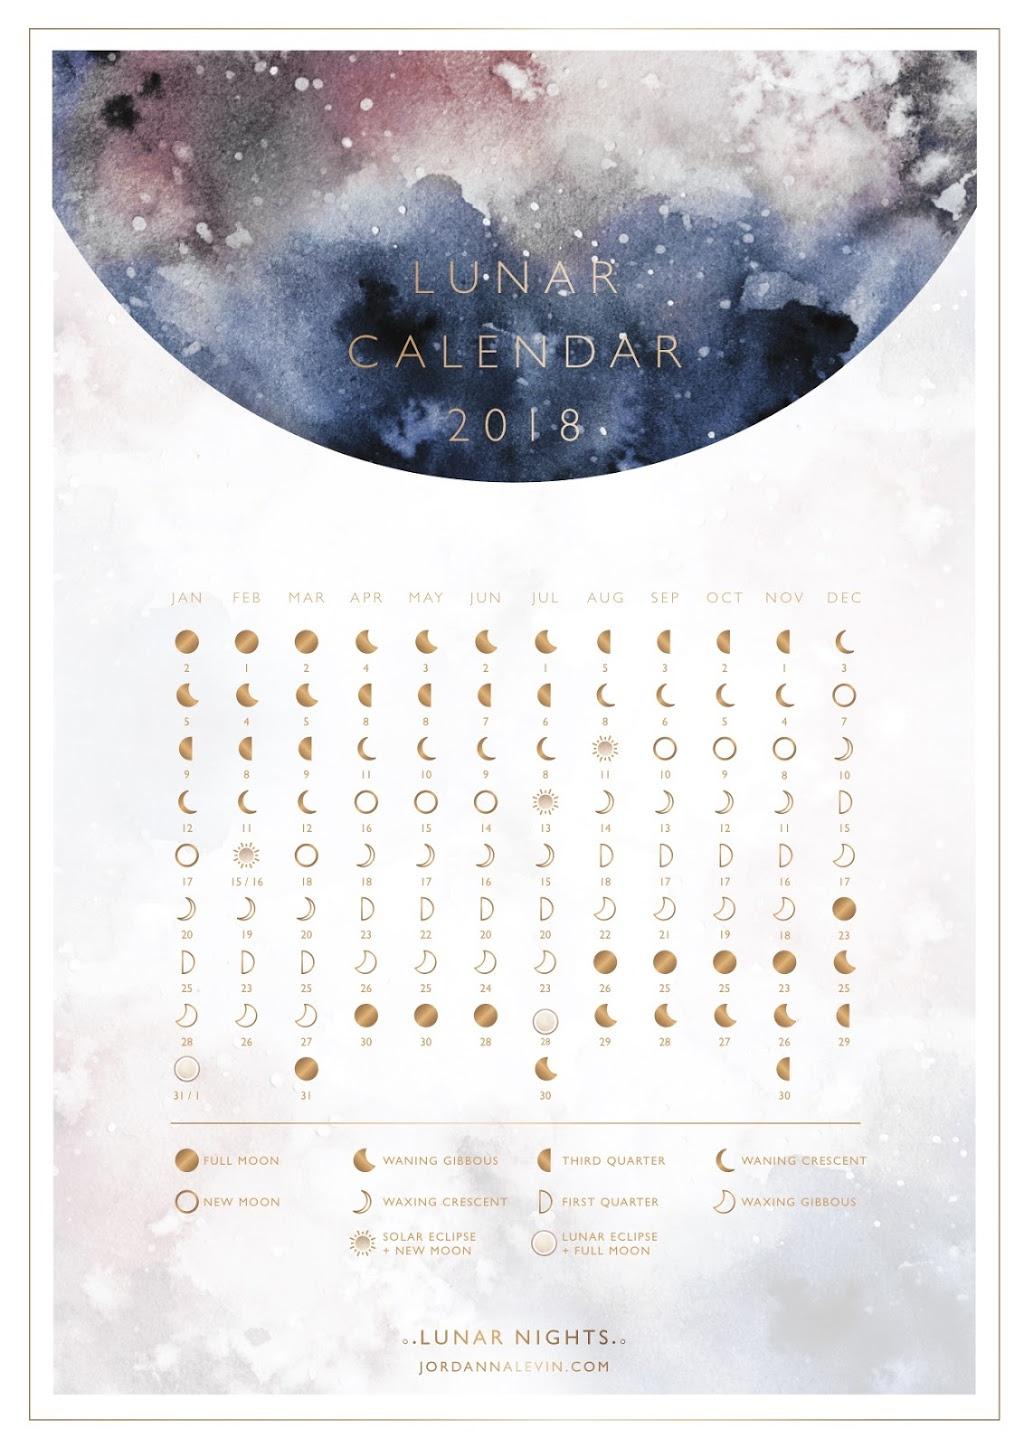 Calendar Lunar : Musings of an average mom year at a glance calendars